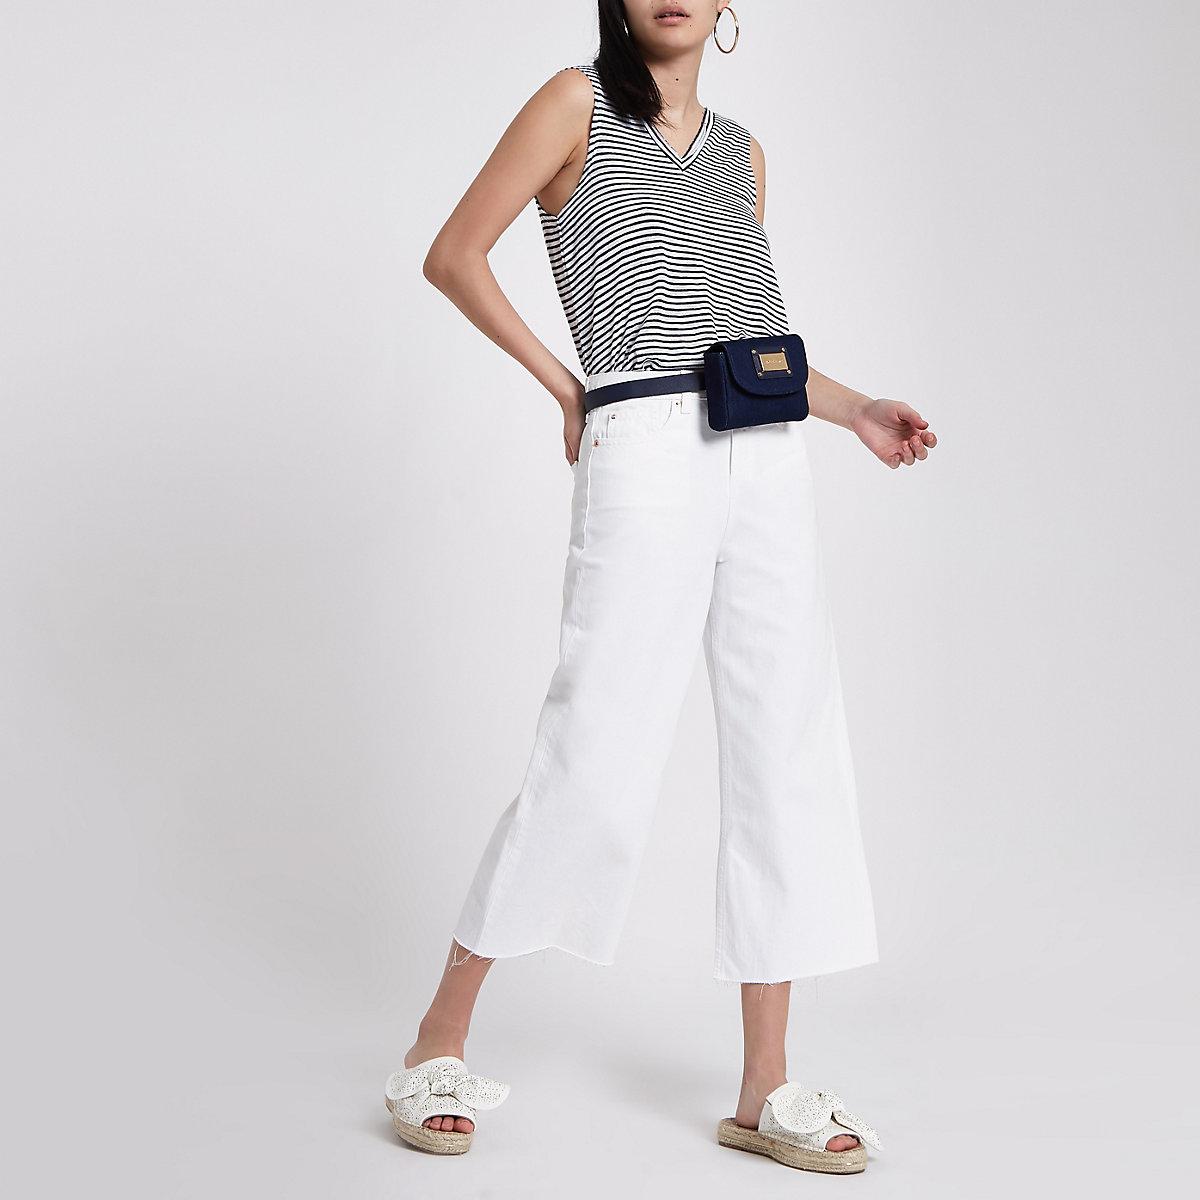 245f29bd3ede27 Witte gestreepte tanktop met V-hals - T-shirts - Tops - Dames